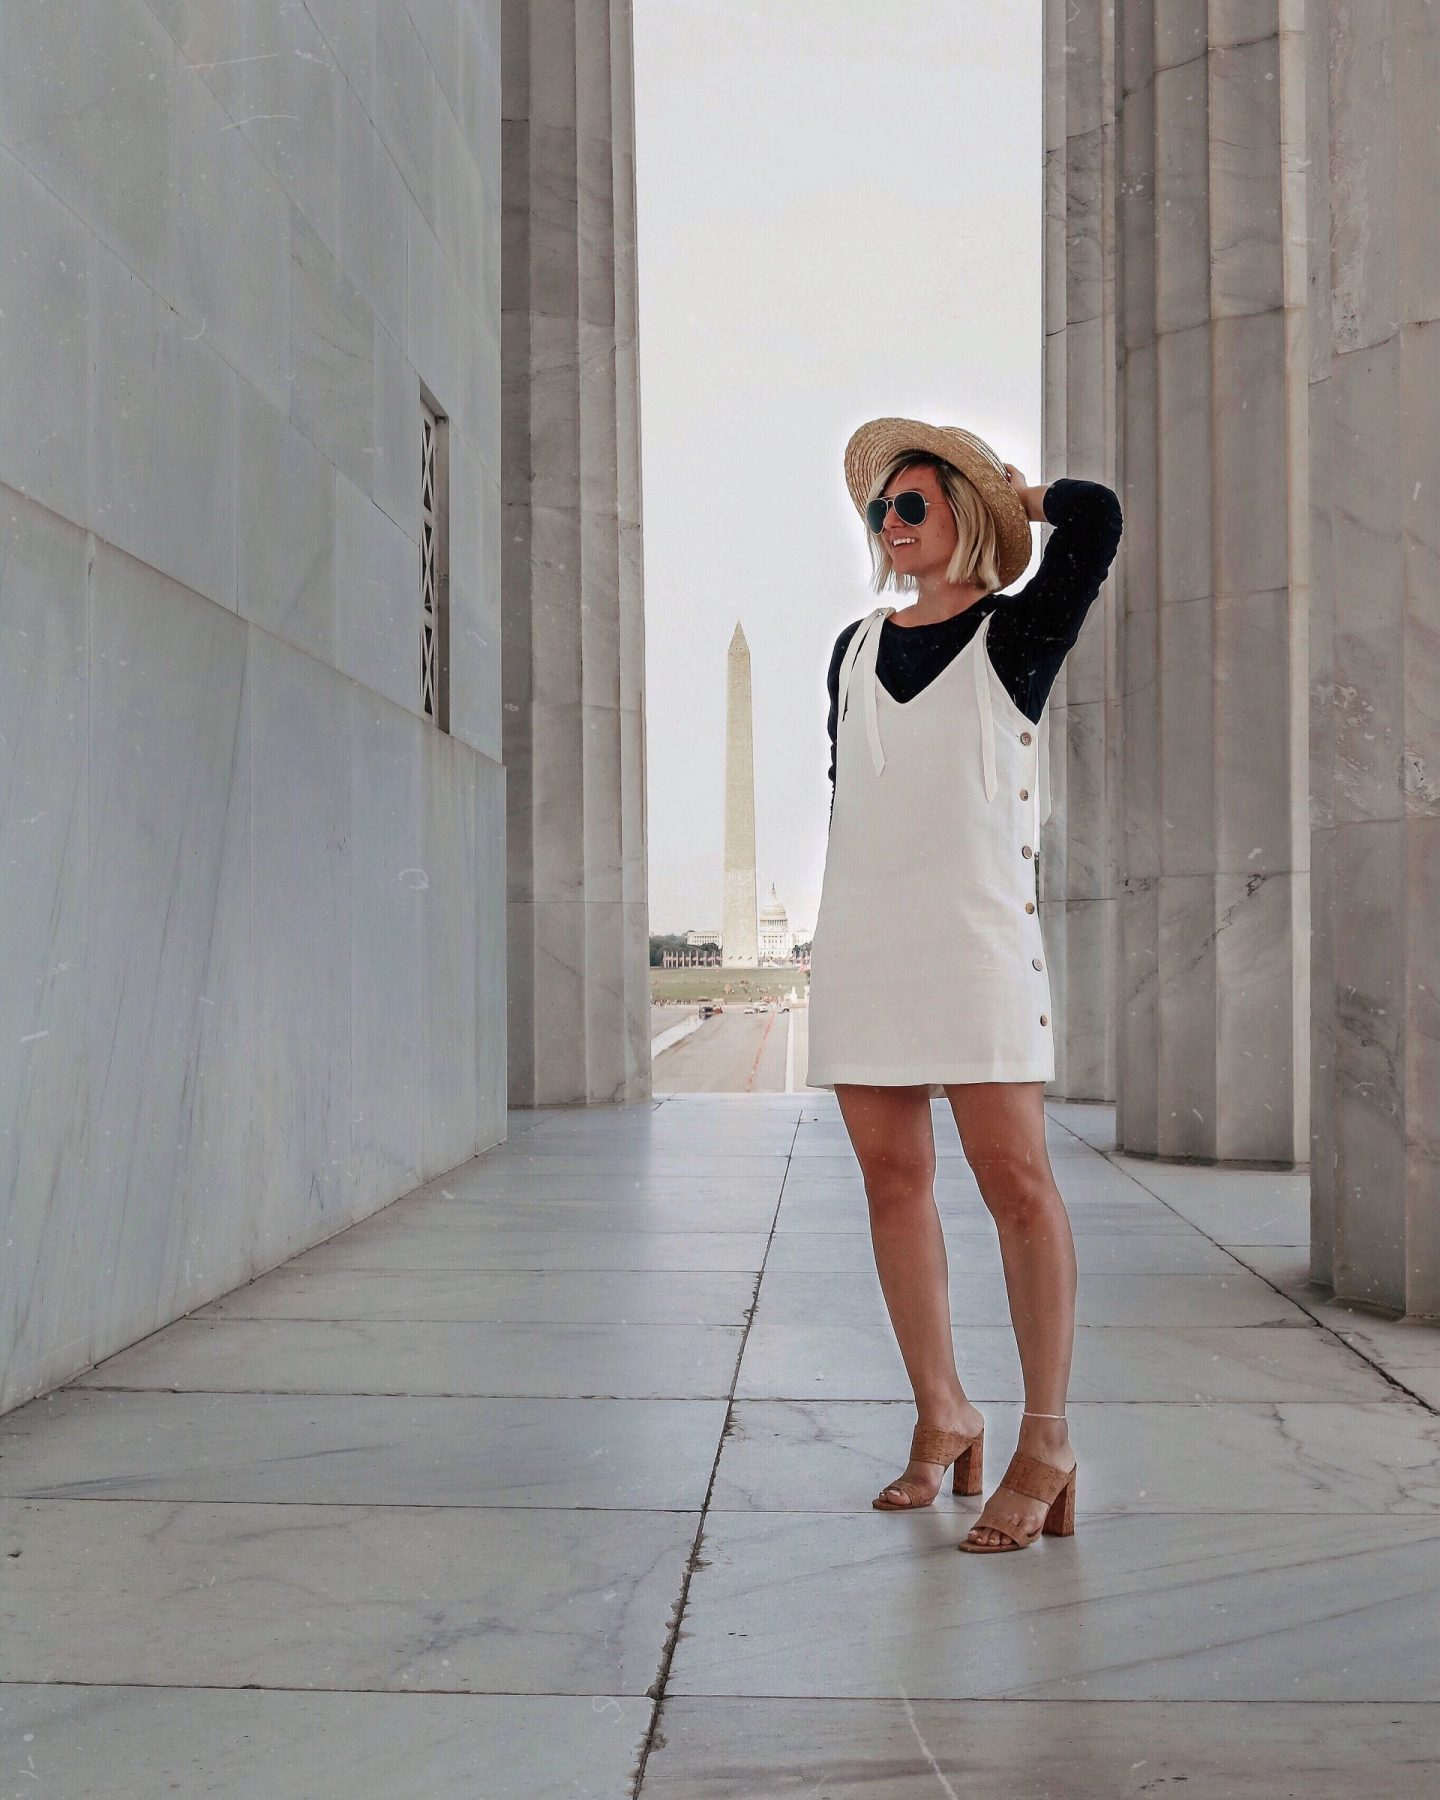 Lincoln memorial, photo spots in DC, photo locations in Washington DC